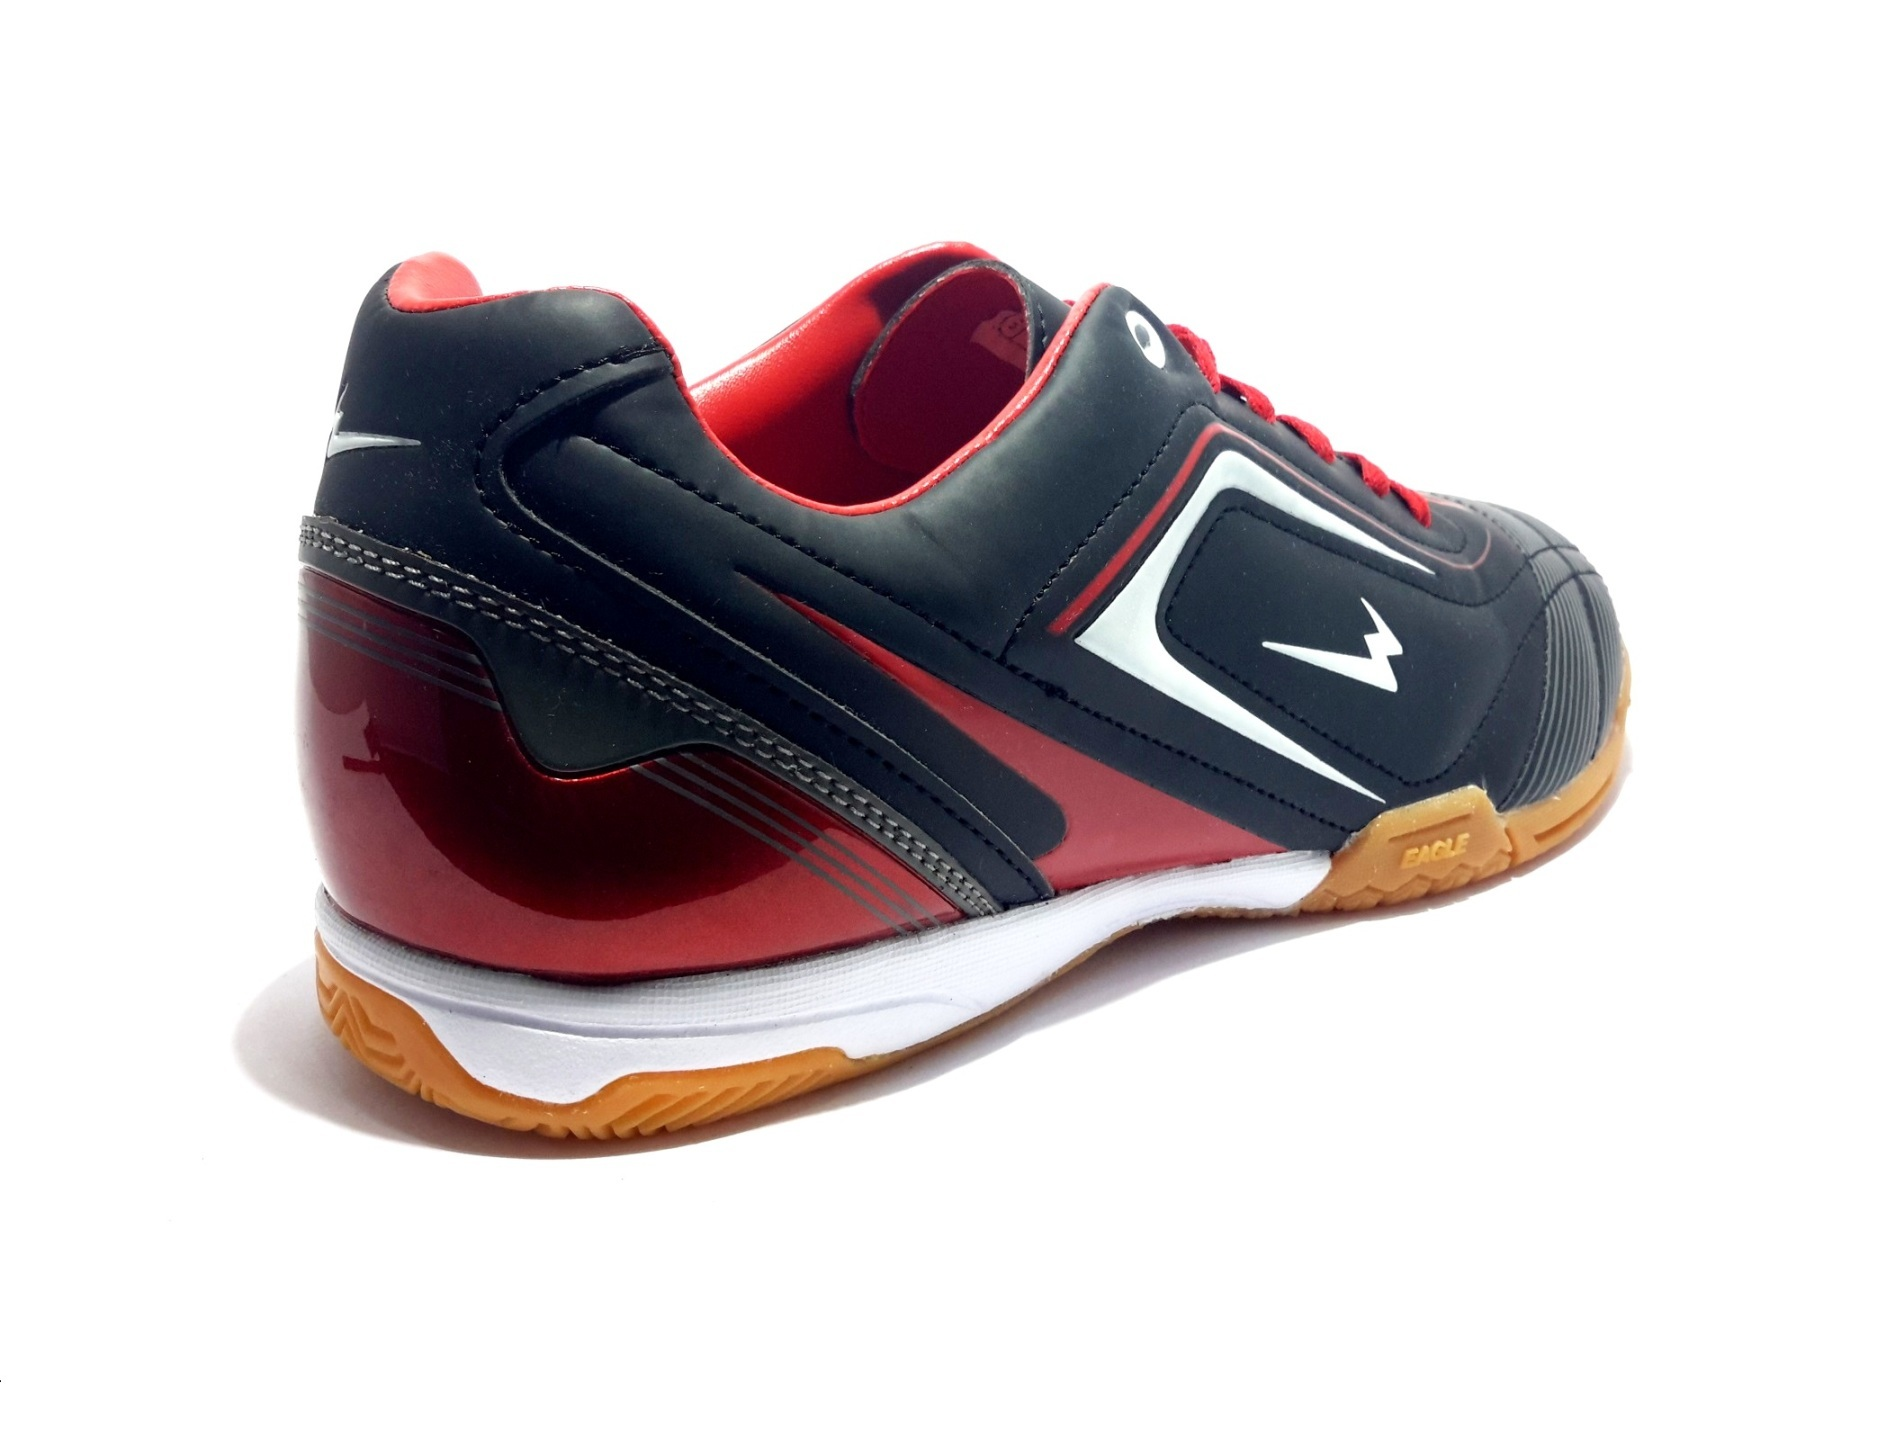 Eagle New Ventura Sepatu Futsal Black Dark Red White